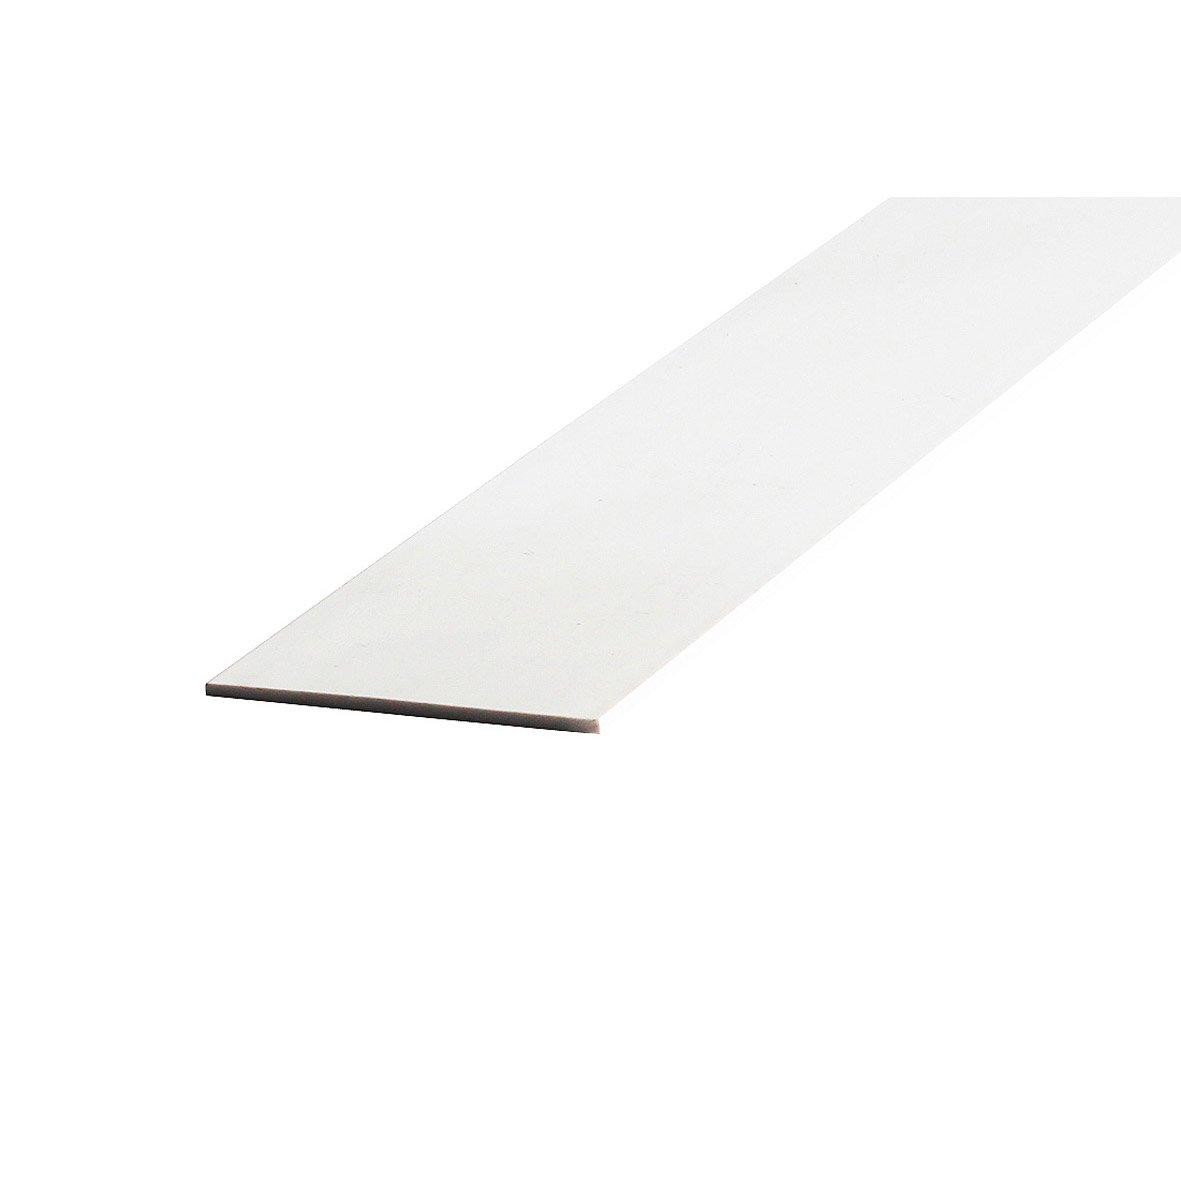 Champlat en pvc blanc 50 x 2 mm l 2 60 m leroy merlin Carrelage 10 x 10